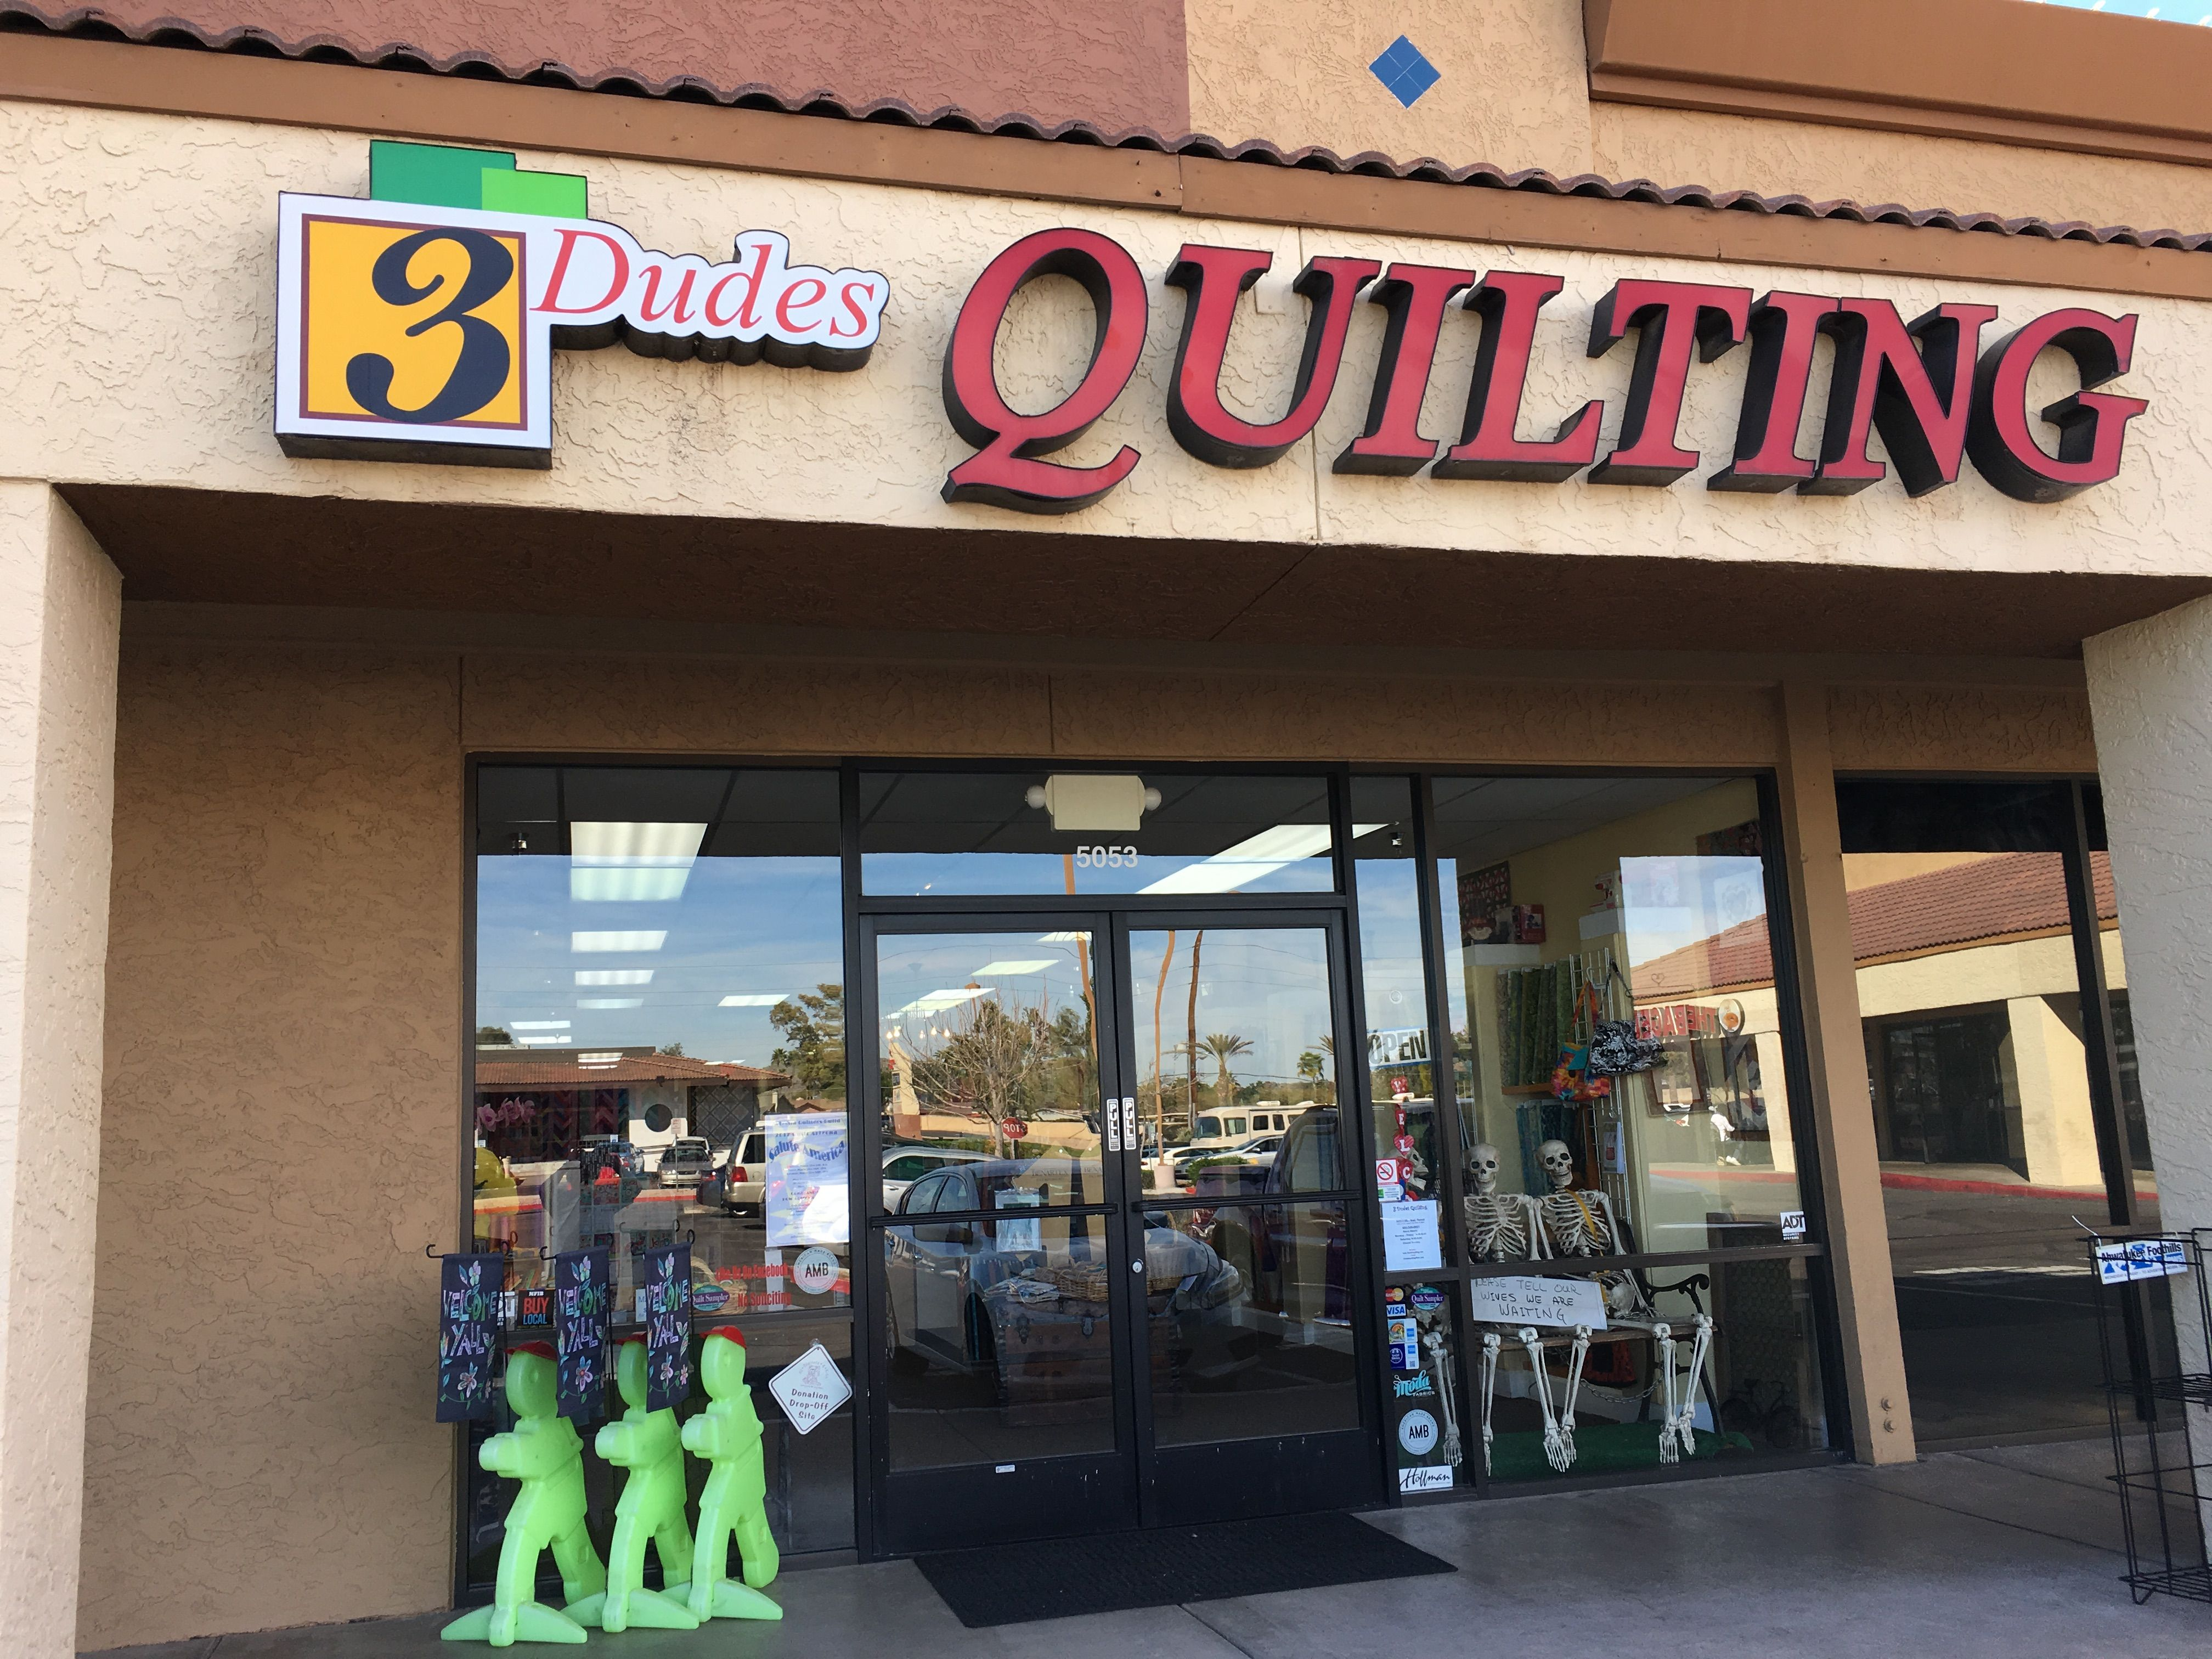 3 Dudes Quilting Phoenix Az Visited 2102017 Nice Shop Took A